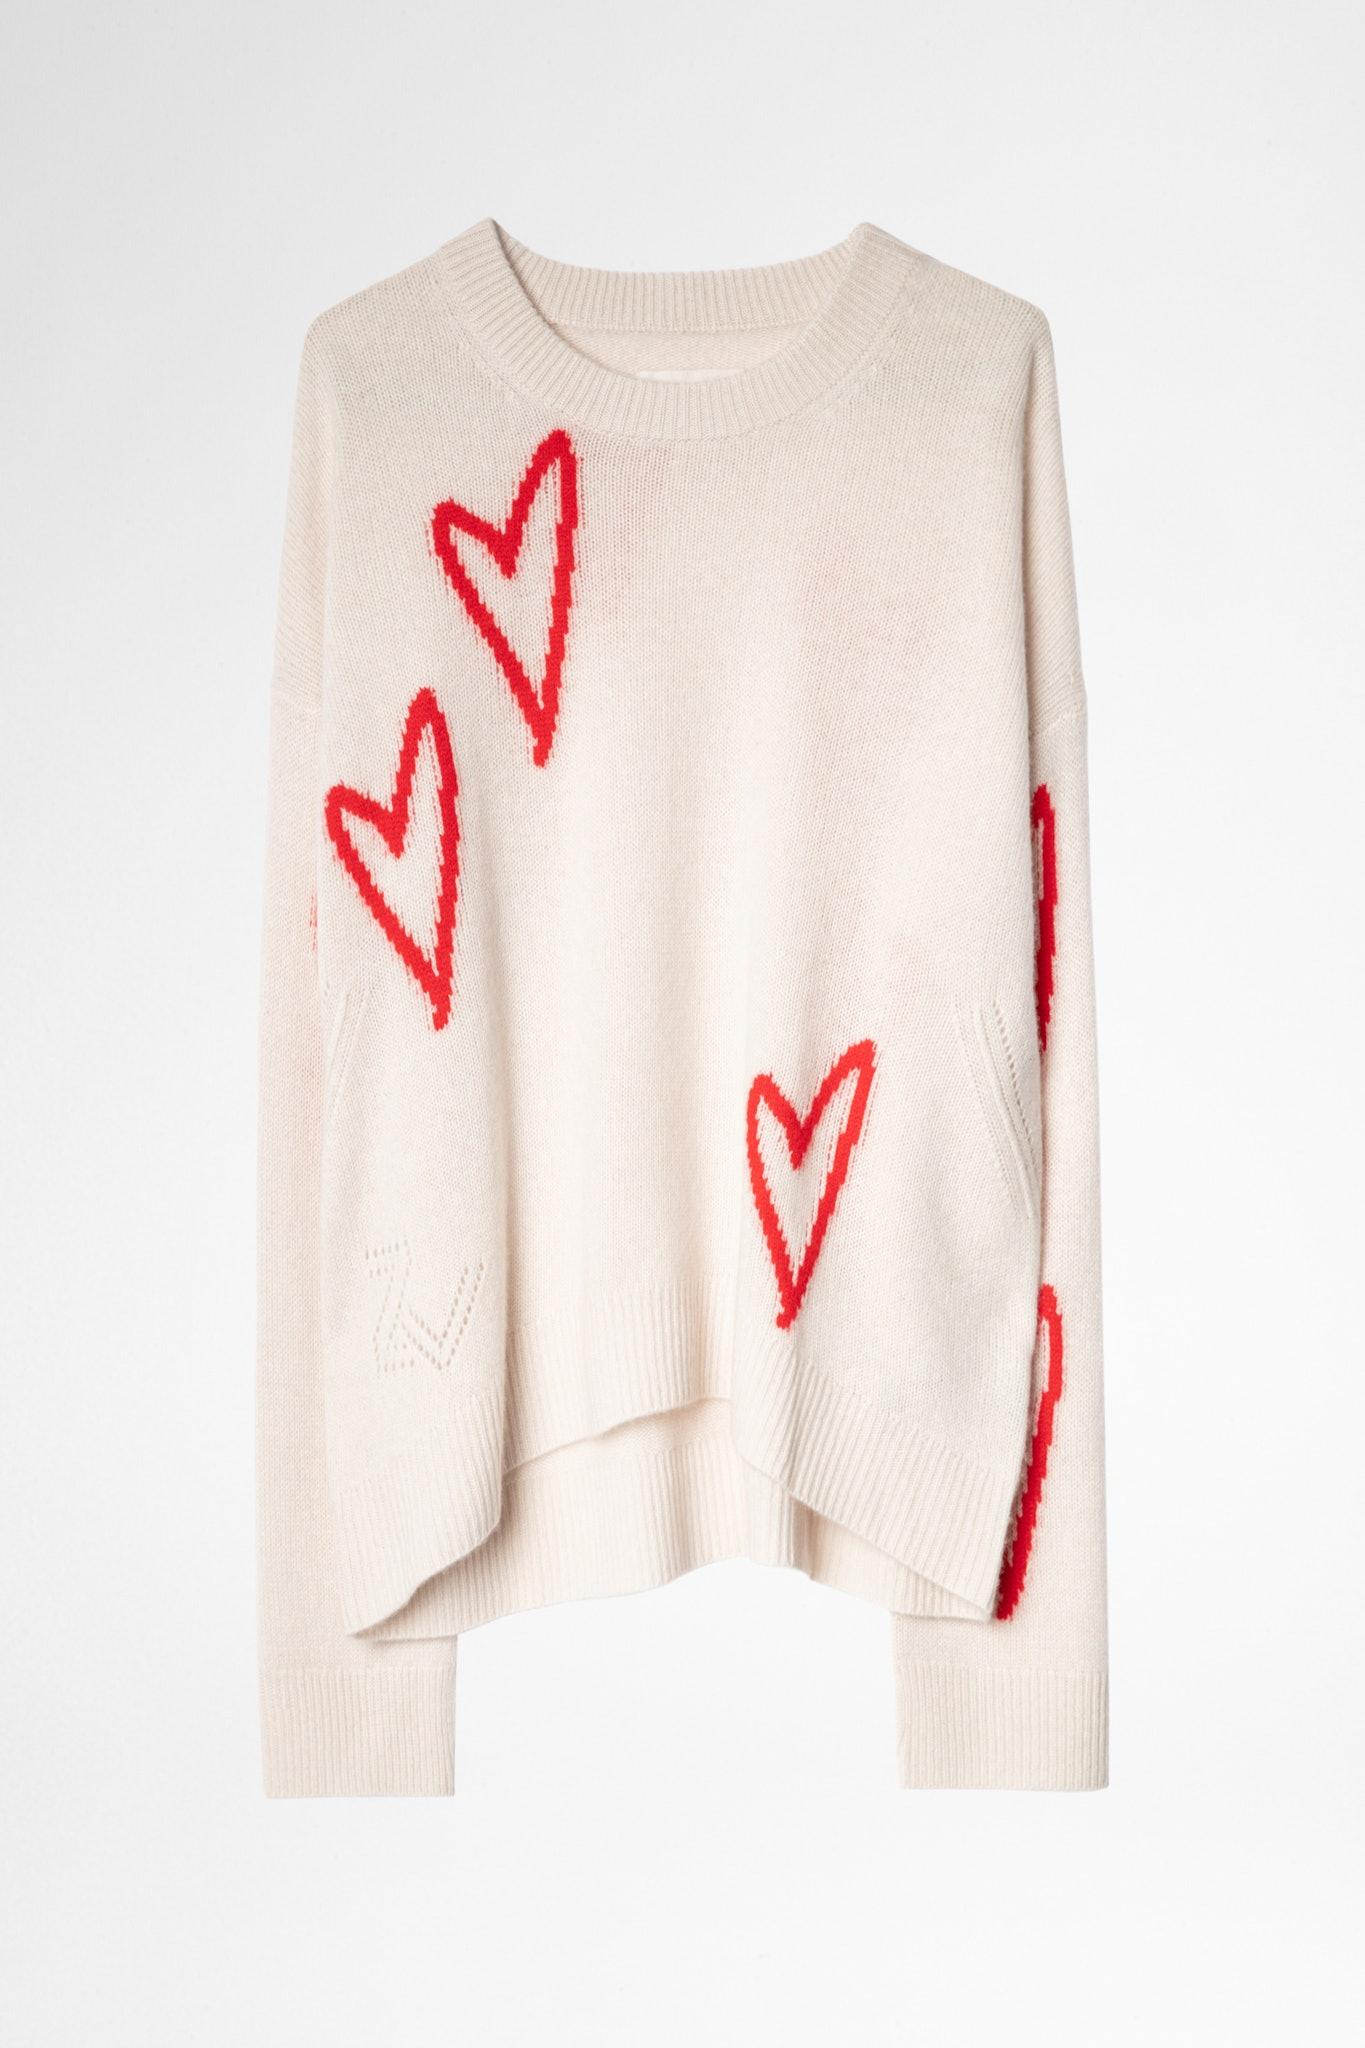 Markus Markus Cachemire Sweater